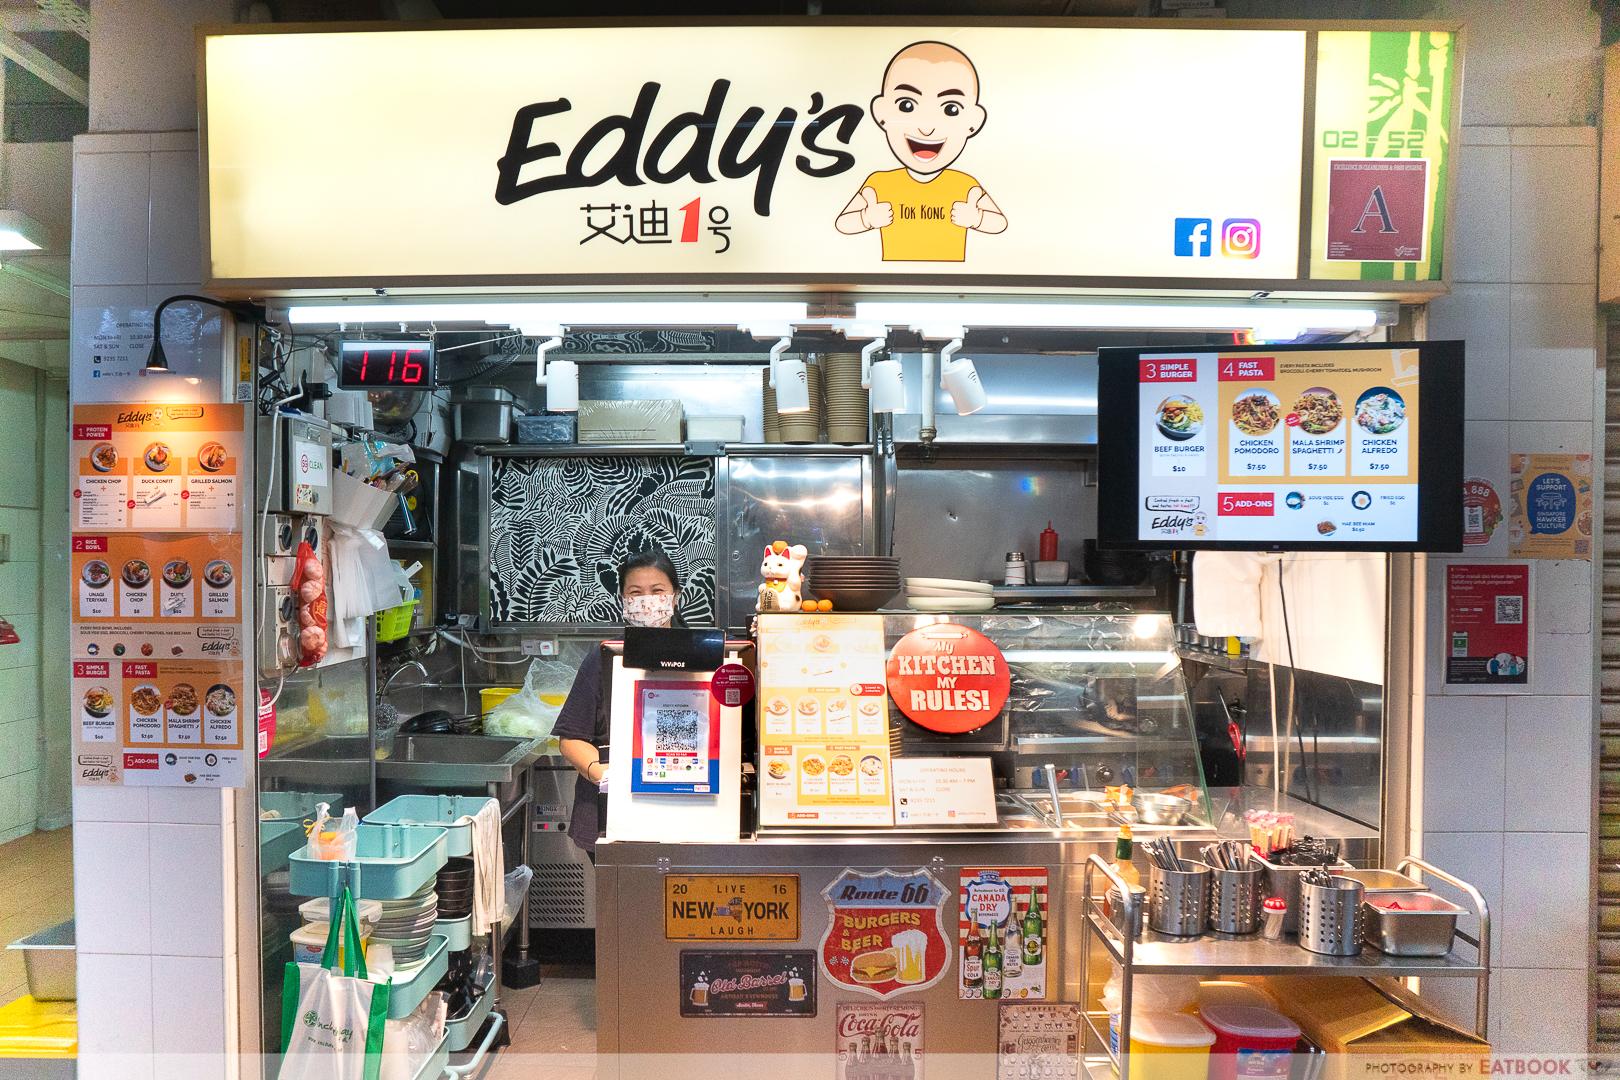 Eddy's No.1 - storefront